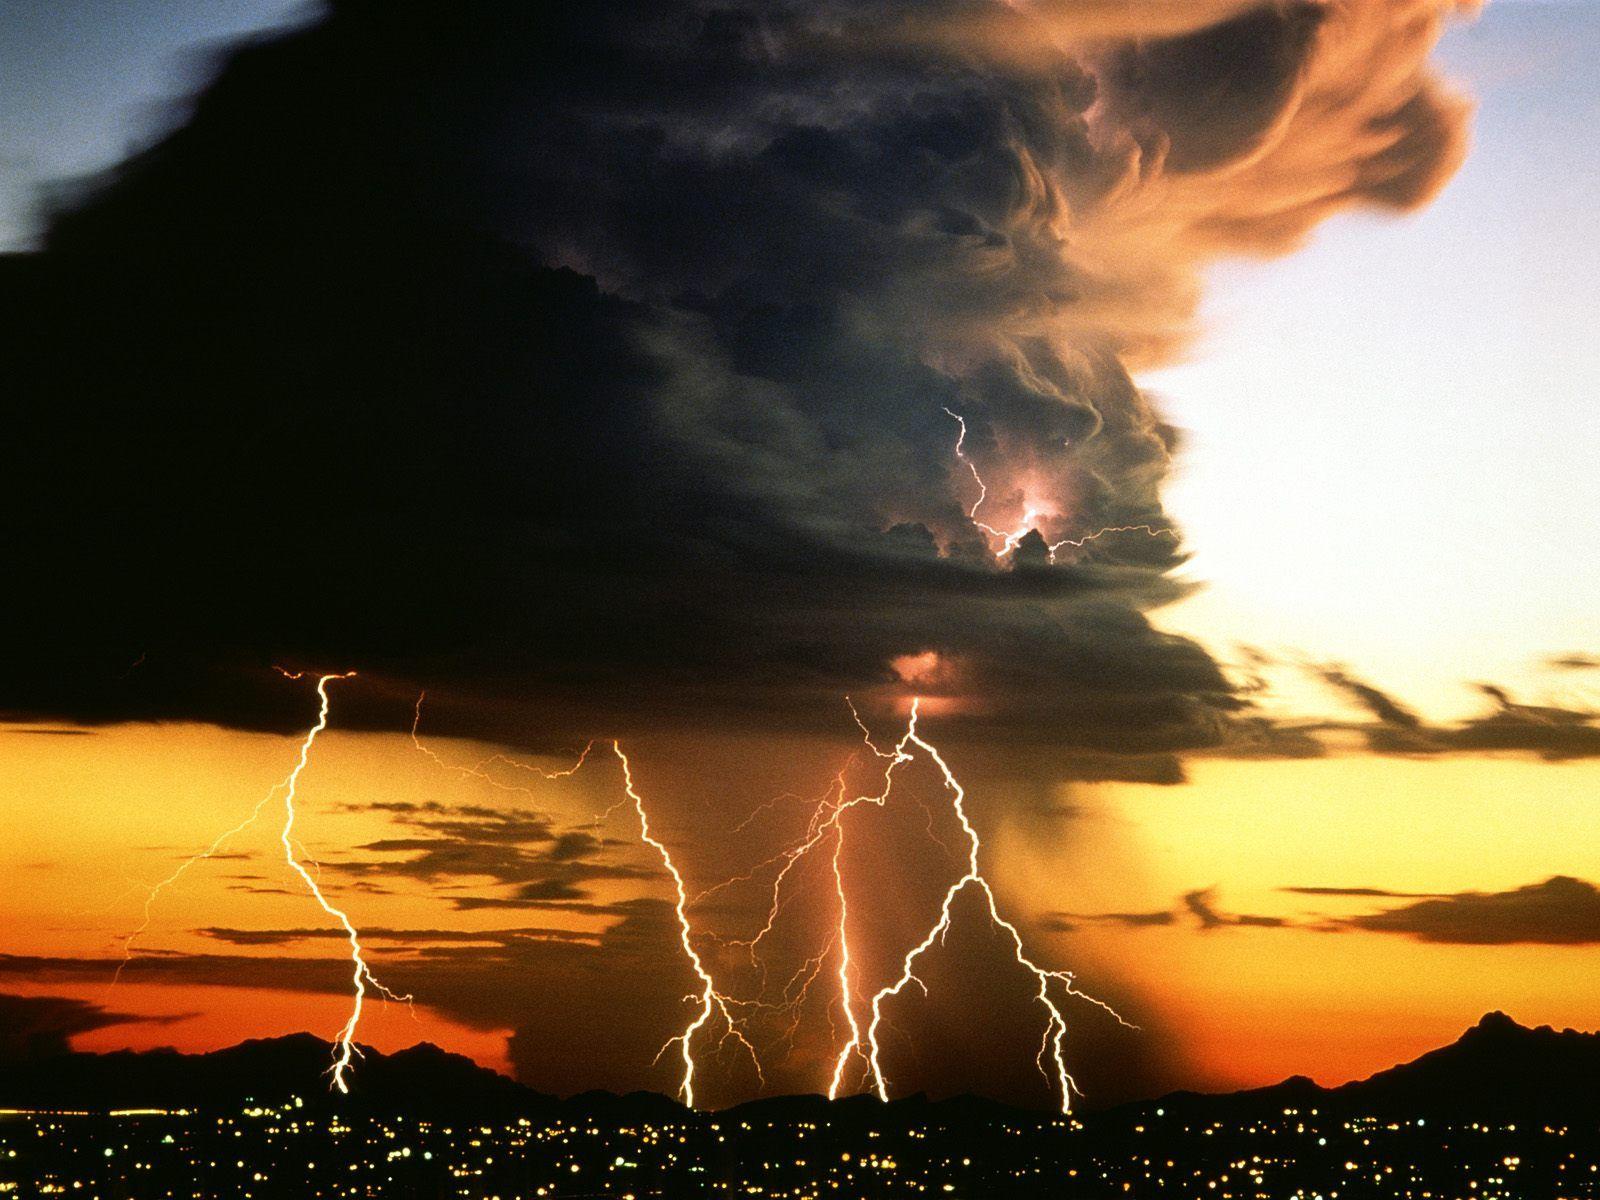 Lightning Storm Over City Lights